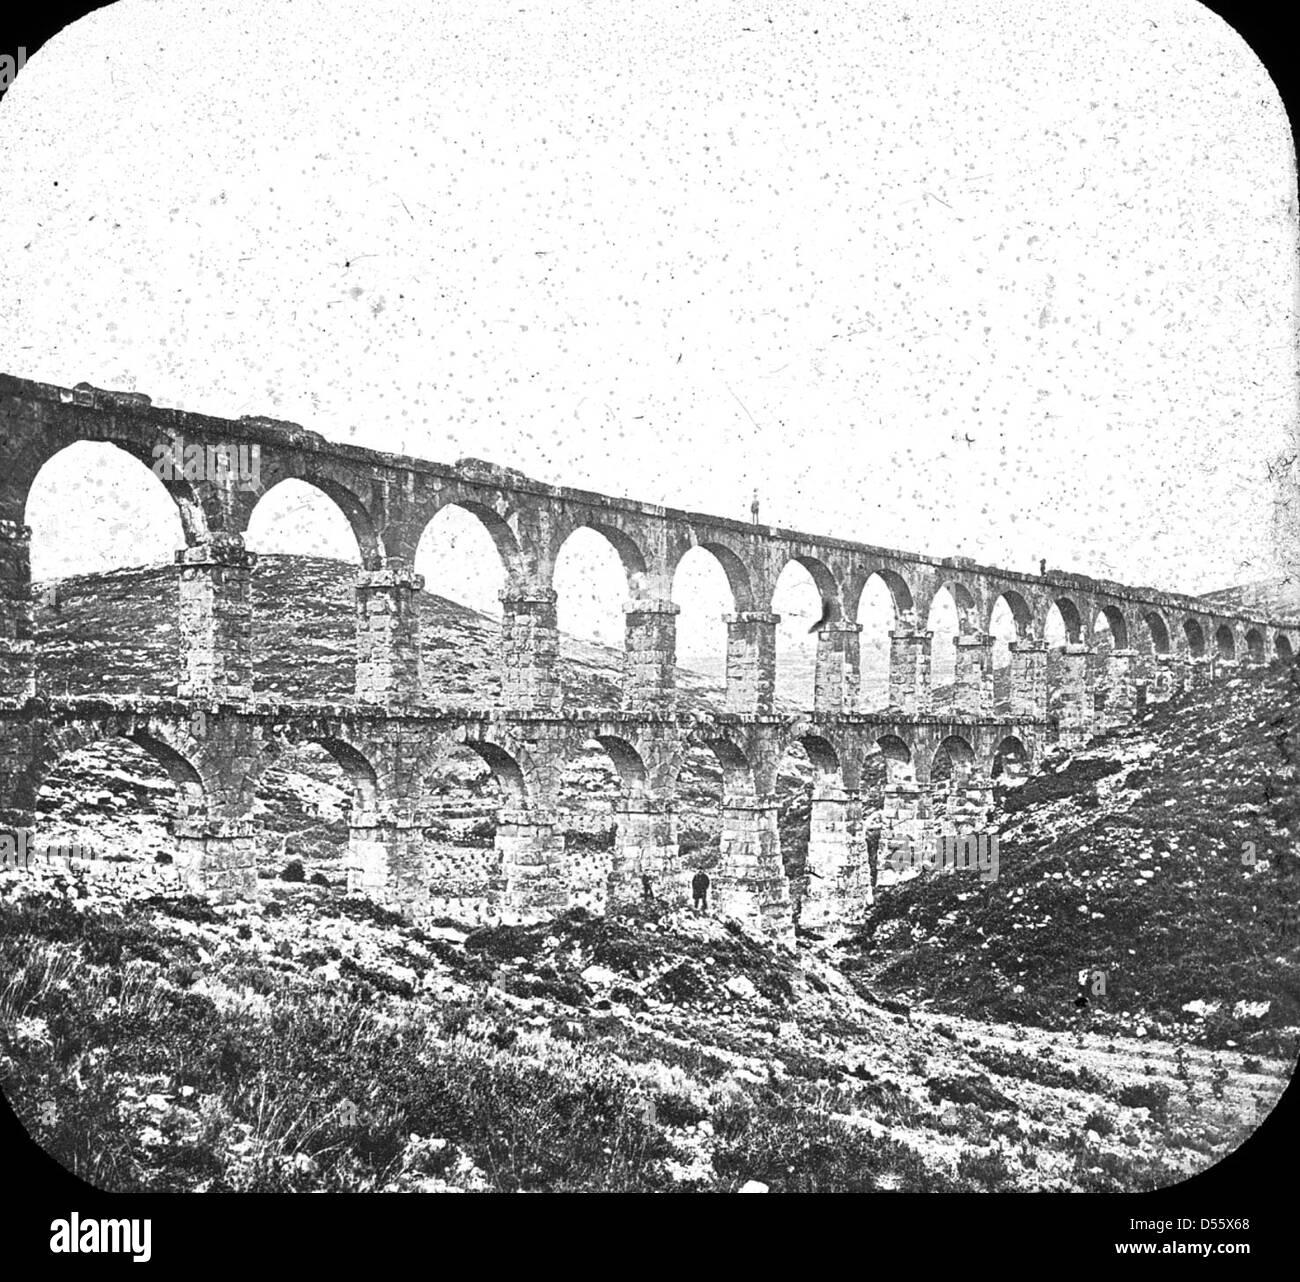 Spain, Tarragonia, Catalonia; Roman aqueduct. - Stock Image